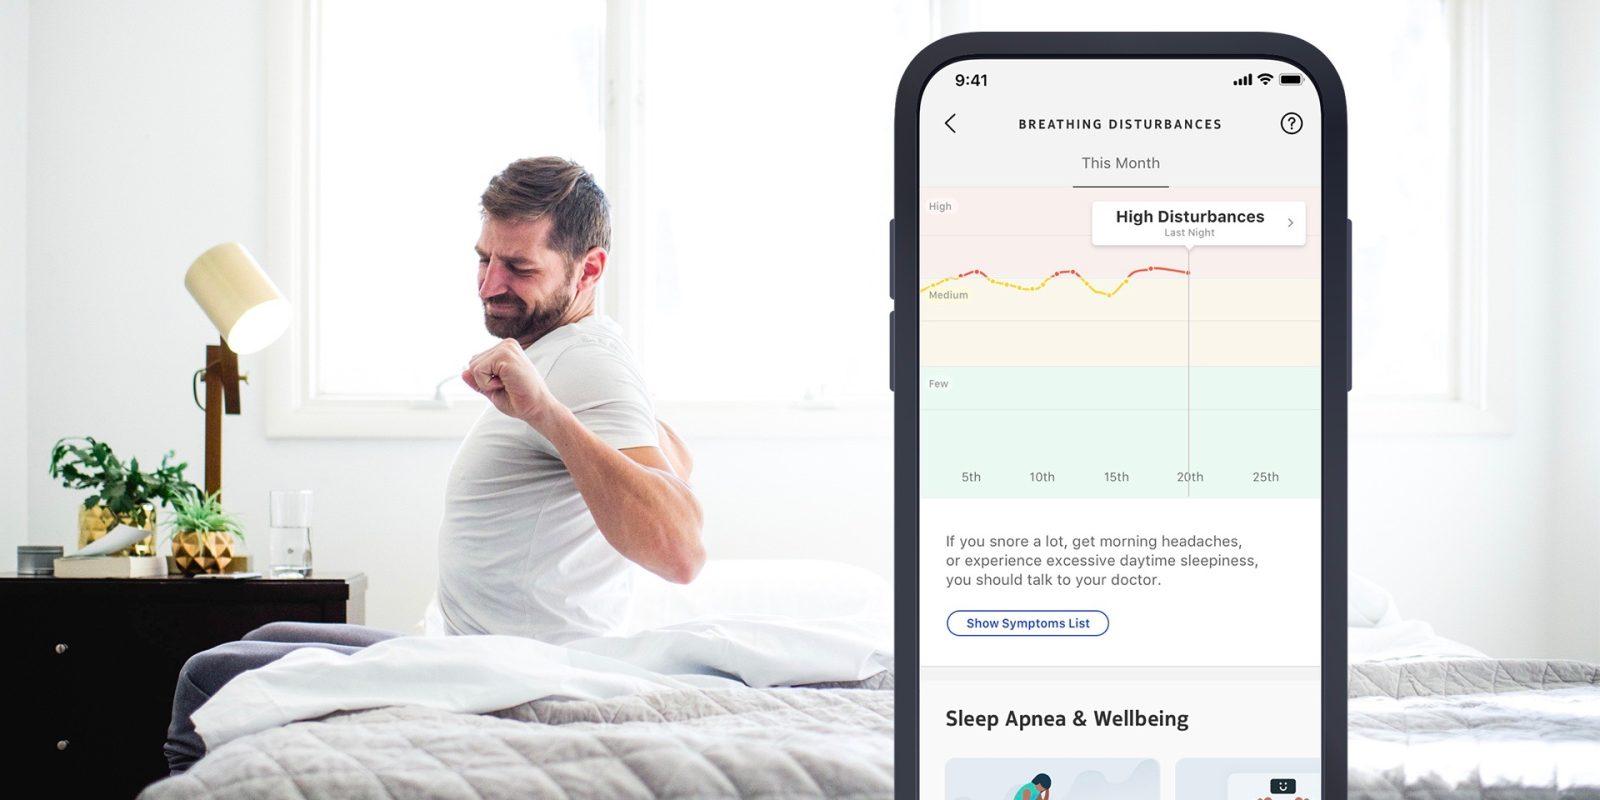 Withings adds sleep apnea detection to its smart sleep mat via software update